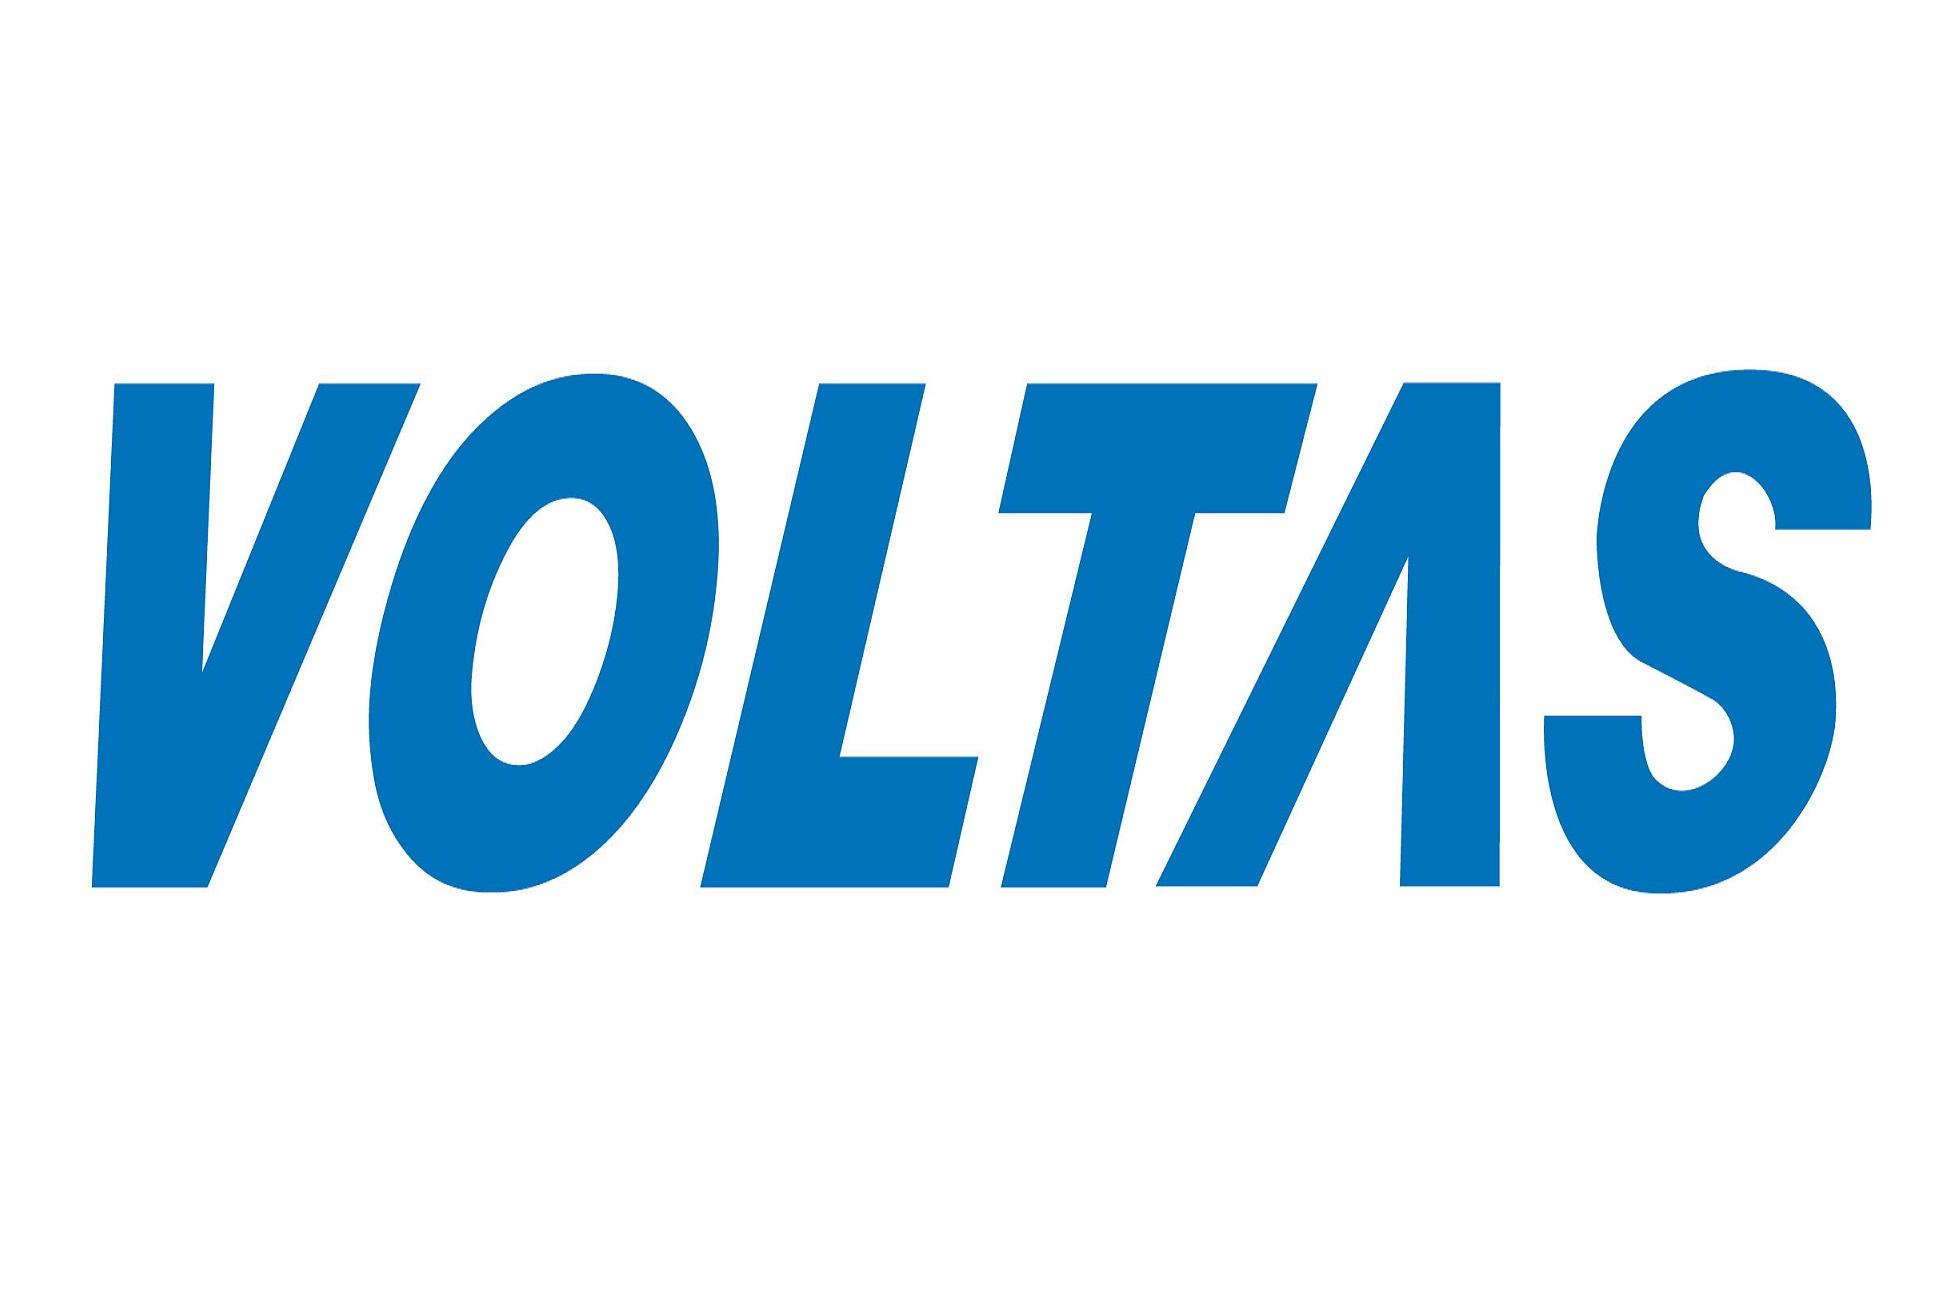 VOLTAS 12VDY 1 TON INVERTER SPLIT AC - Reviews |Price